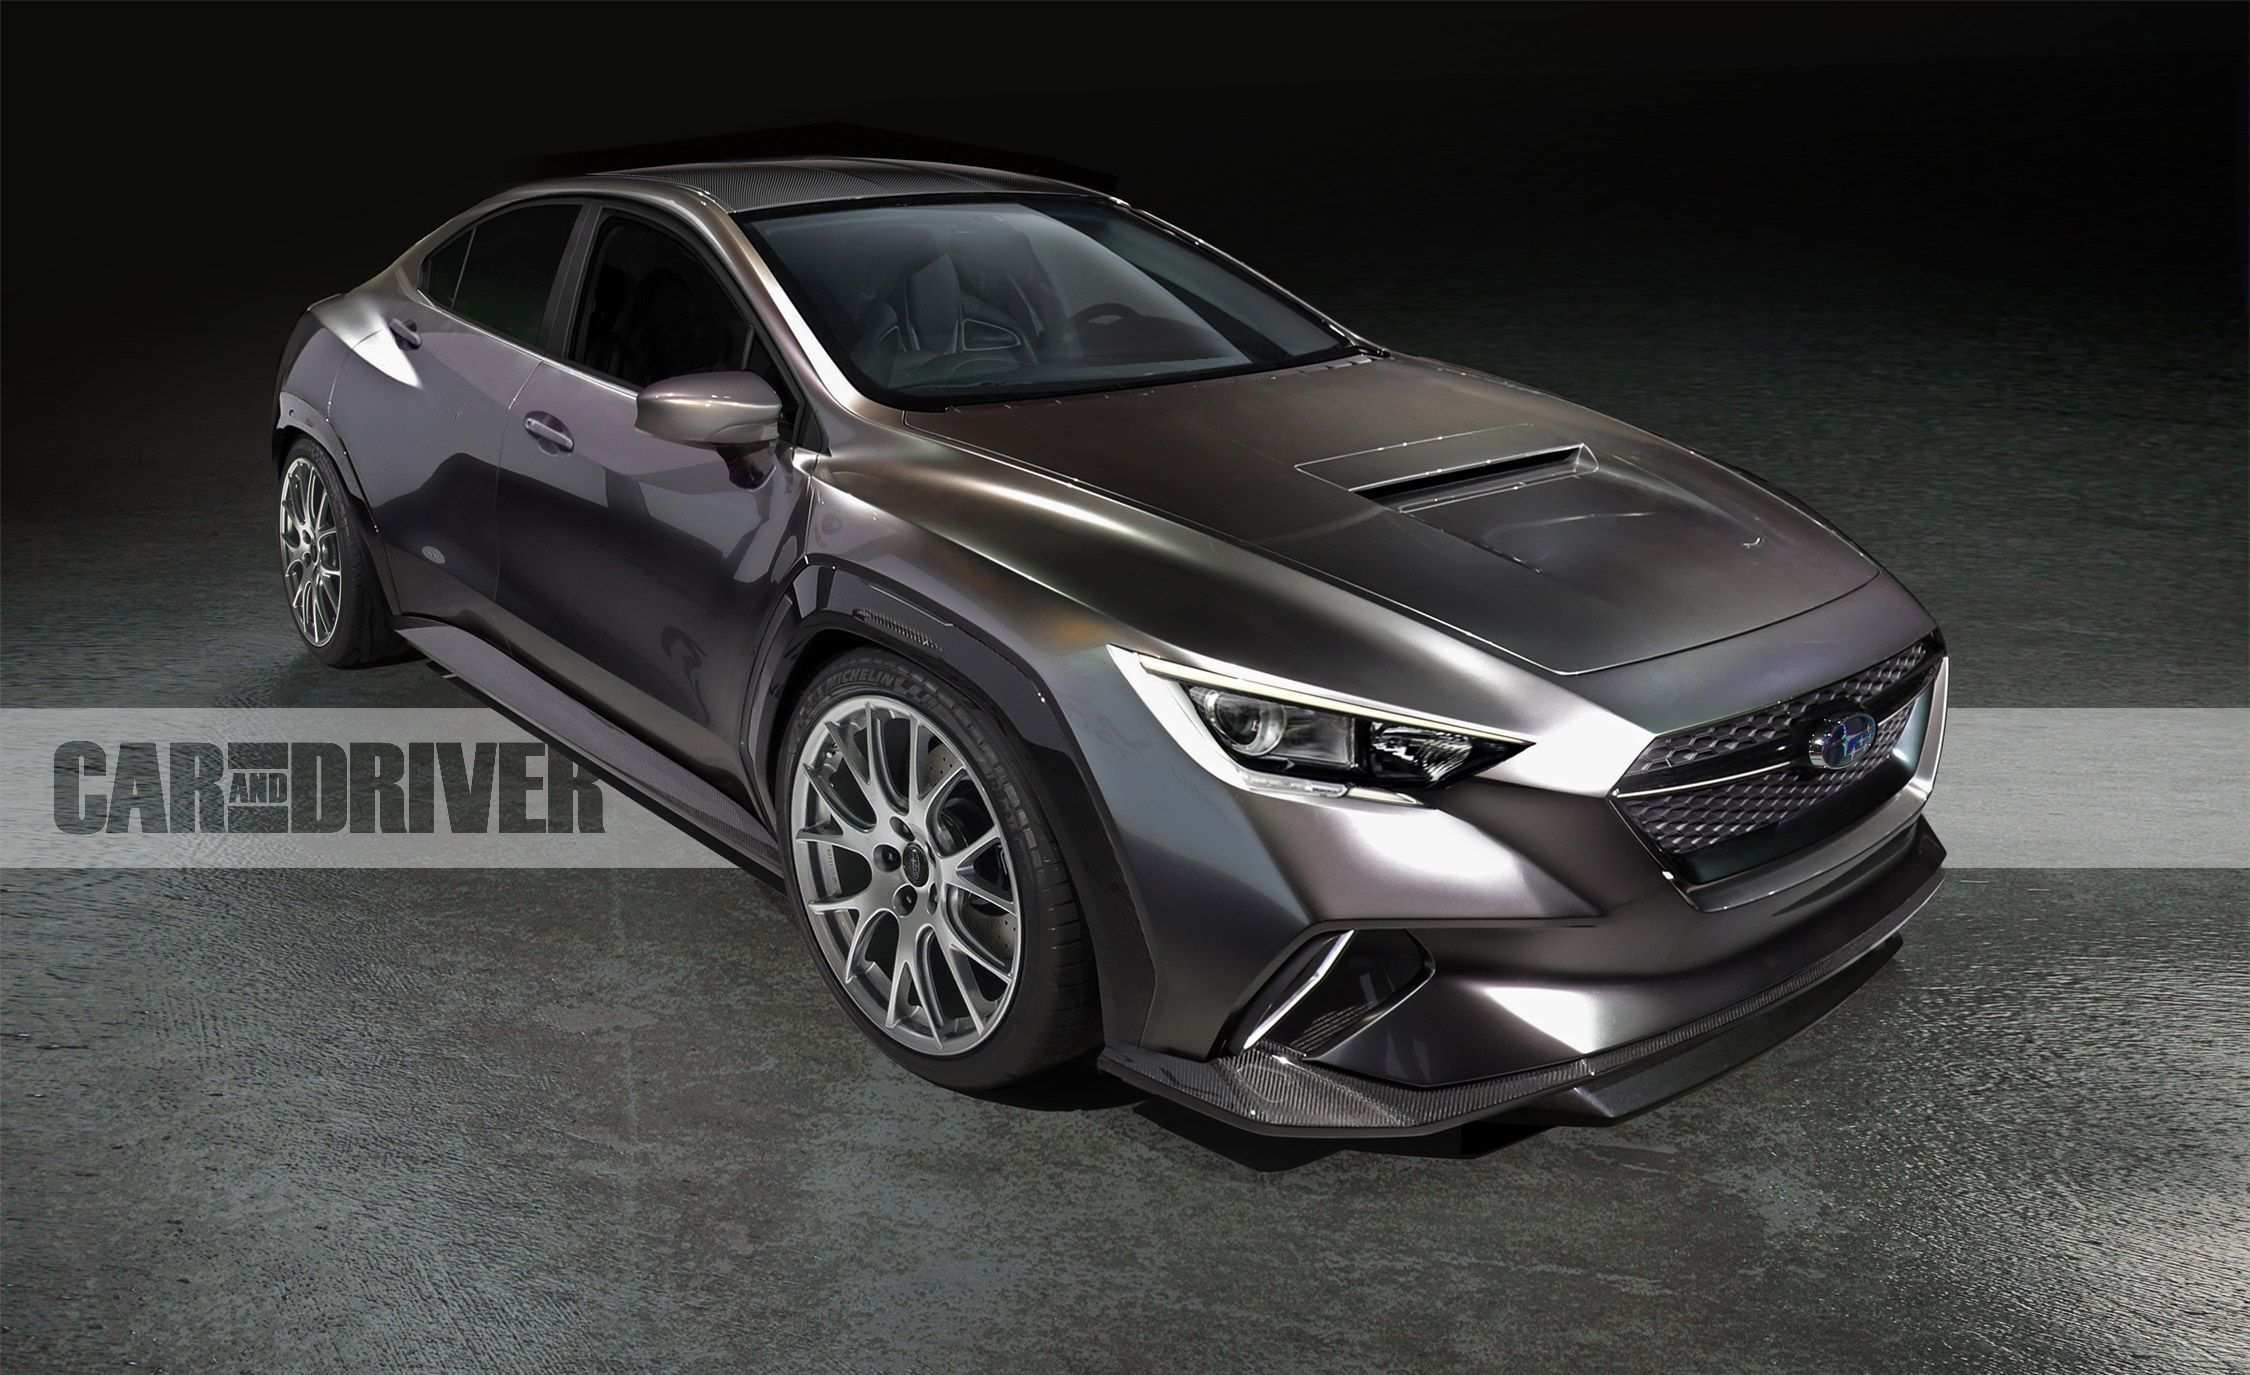 71 Concept of Subaru Wrx 2020 Exterior New Concept by Subaru Wrx 2020 Exterior